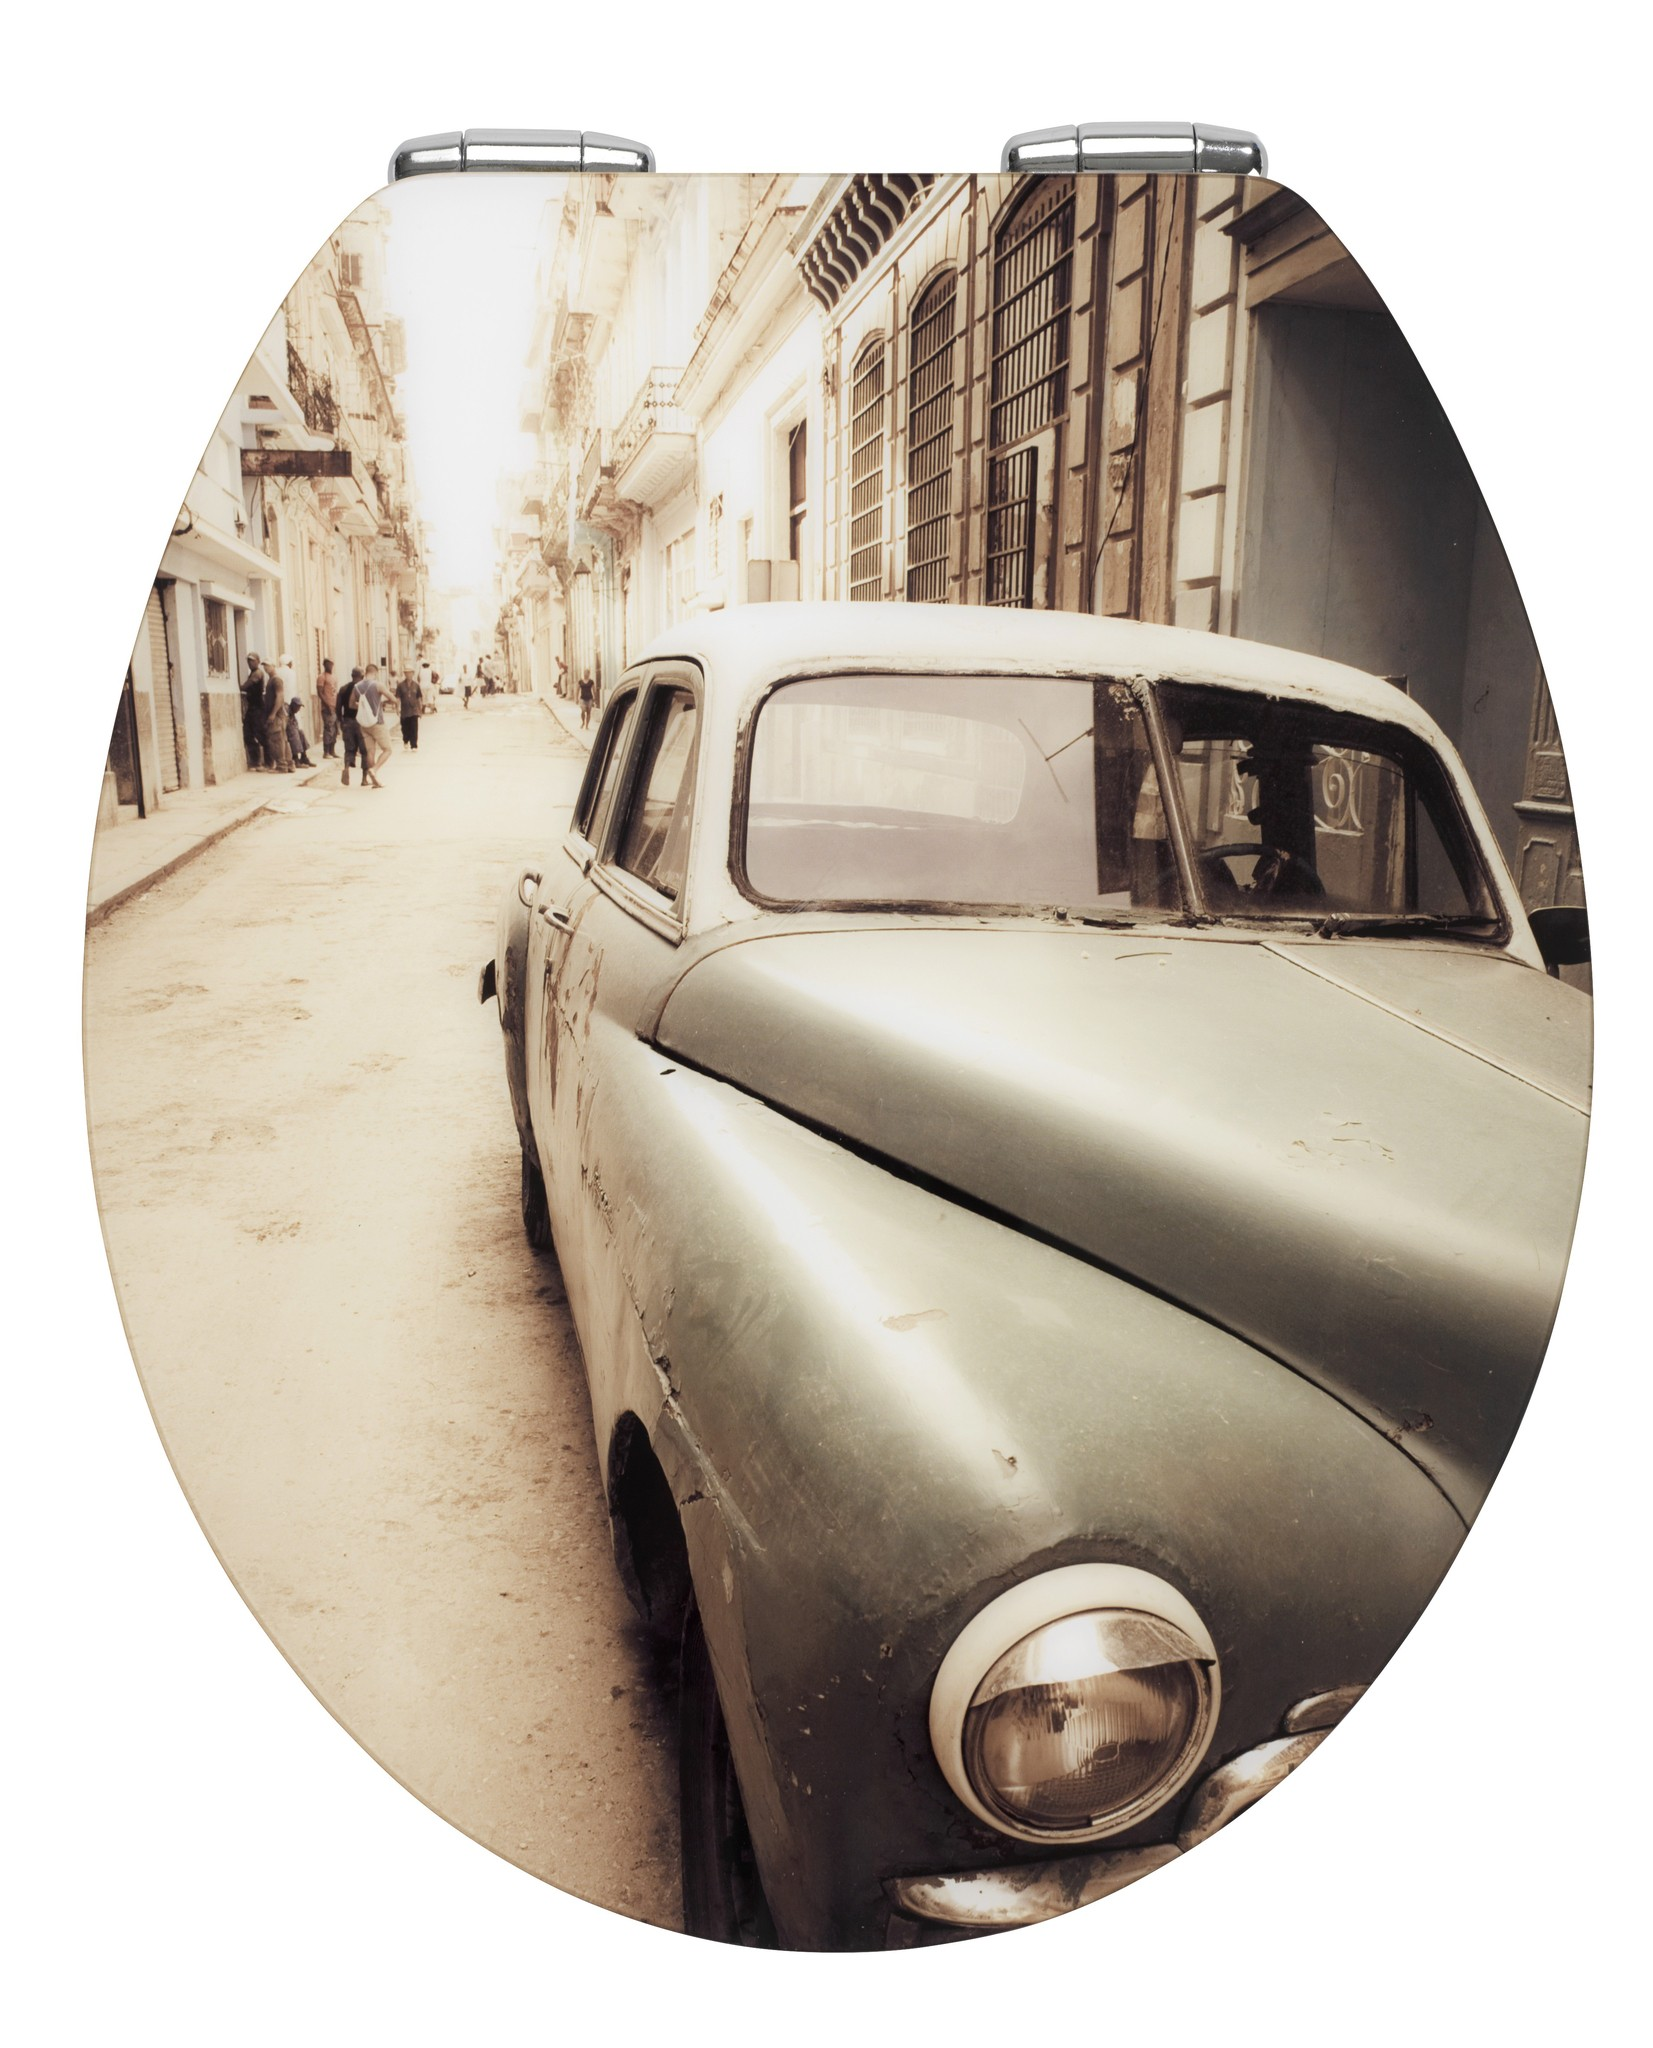 Wenko WC-Sitz Hochglanz Acryl Old-Time Car, mit Absenkautomatik, MDF